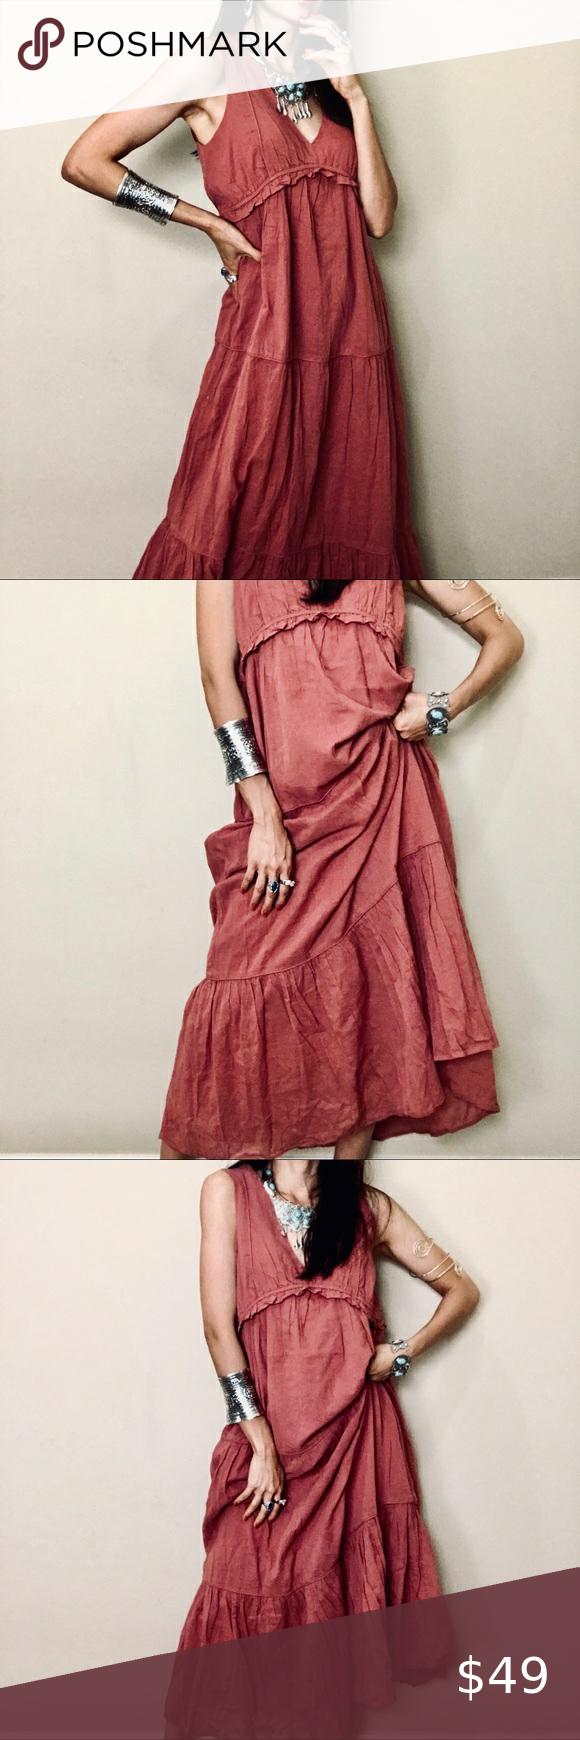 Brand New Rachel Zoe Maxi Dress Brand New Size M Bust 40 Waistline 44 Elastic Band Adjustable Length 53 Rach Maxi Dress Rachel Zoe Dresses Womens Dresses [ 1740 x 580 Pixel ]